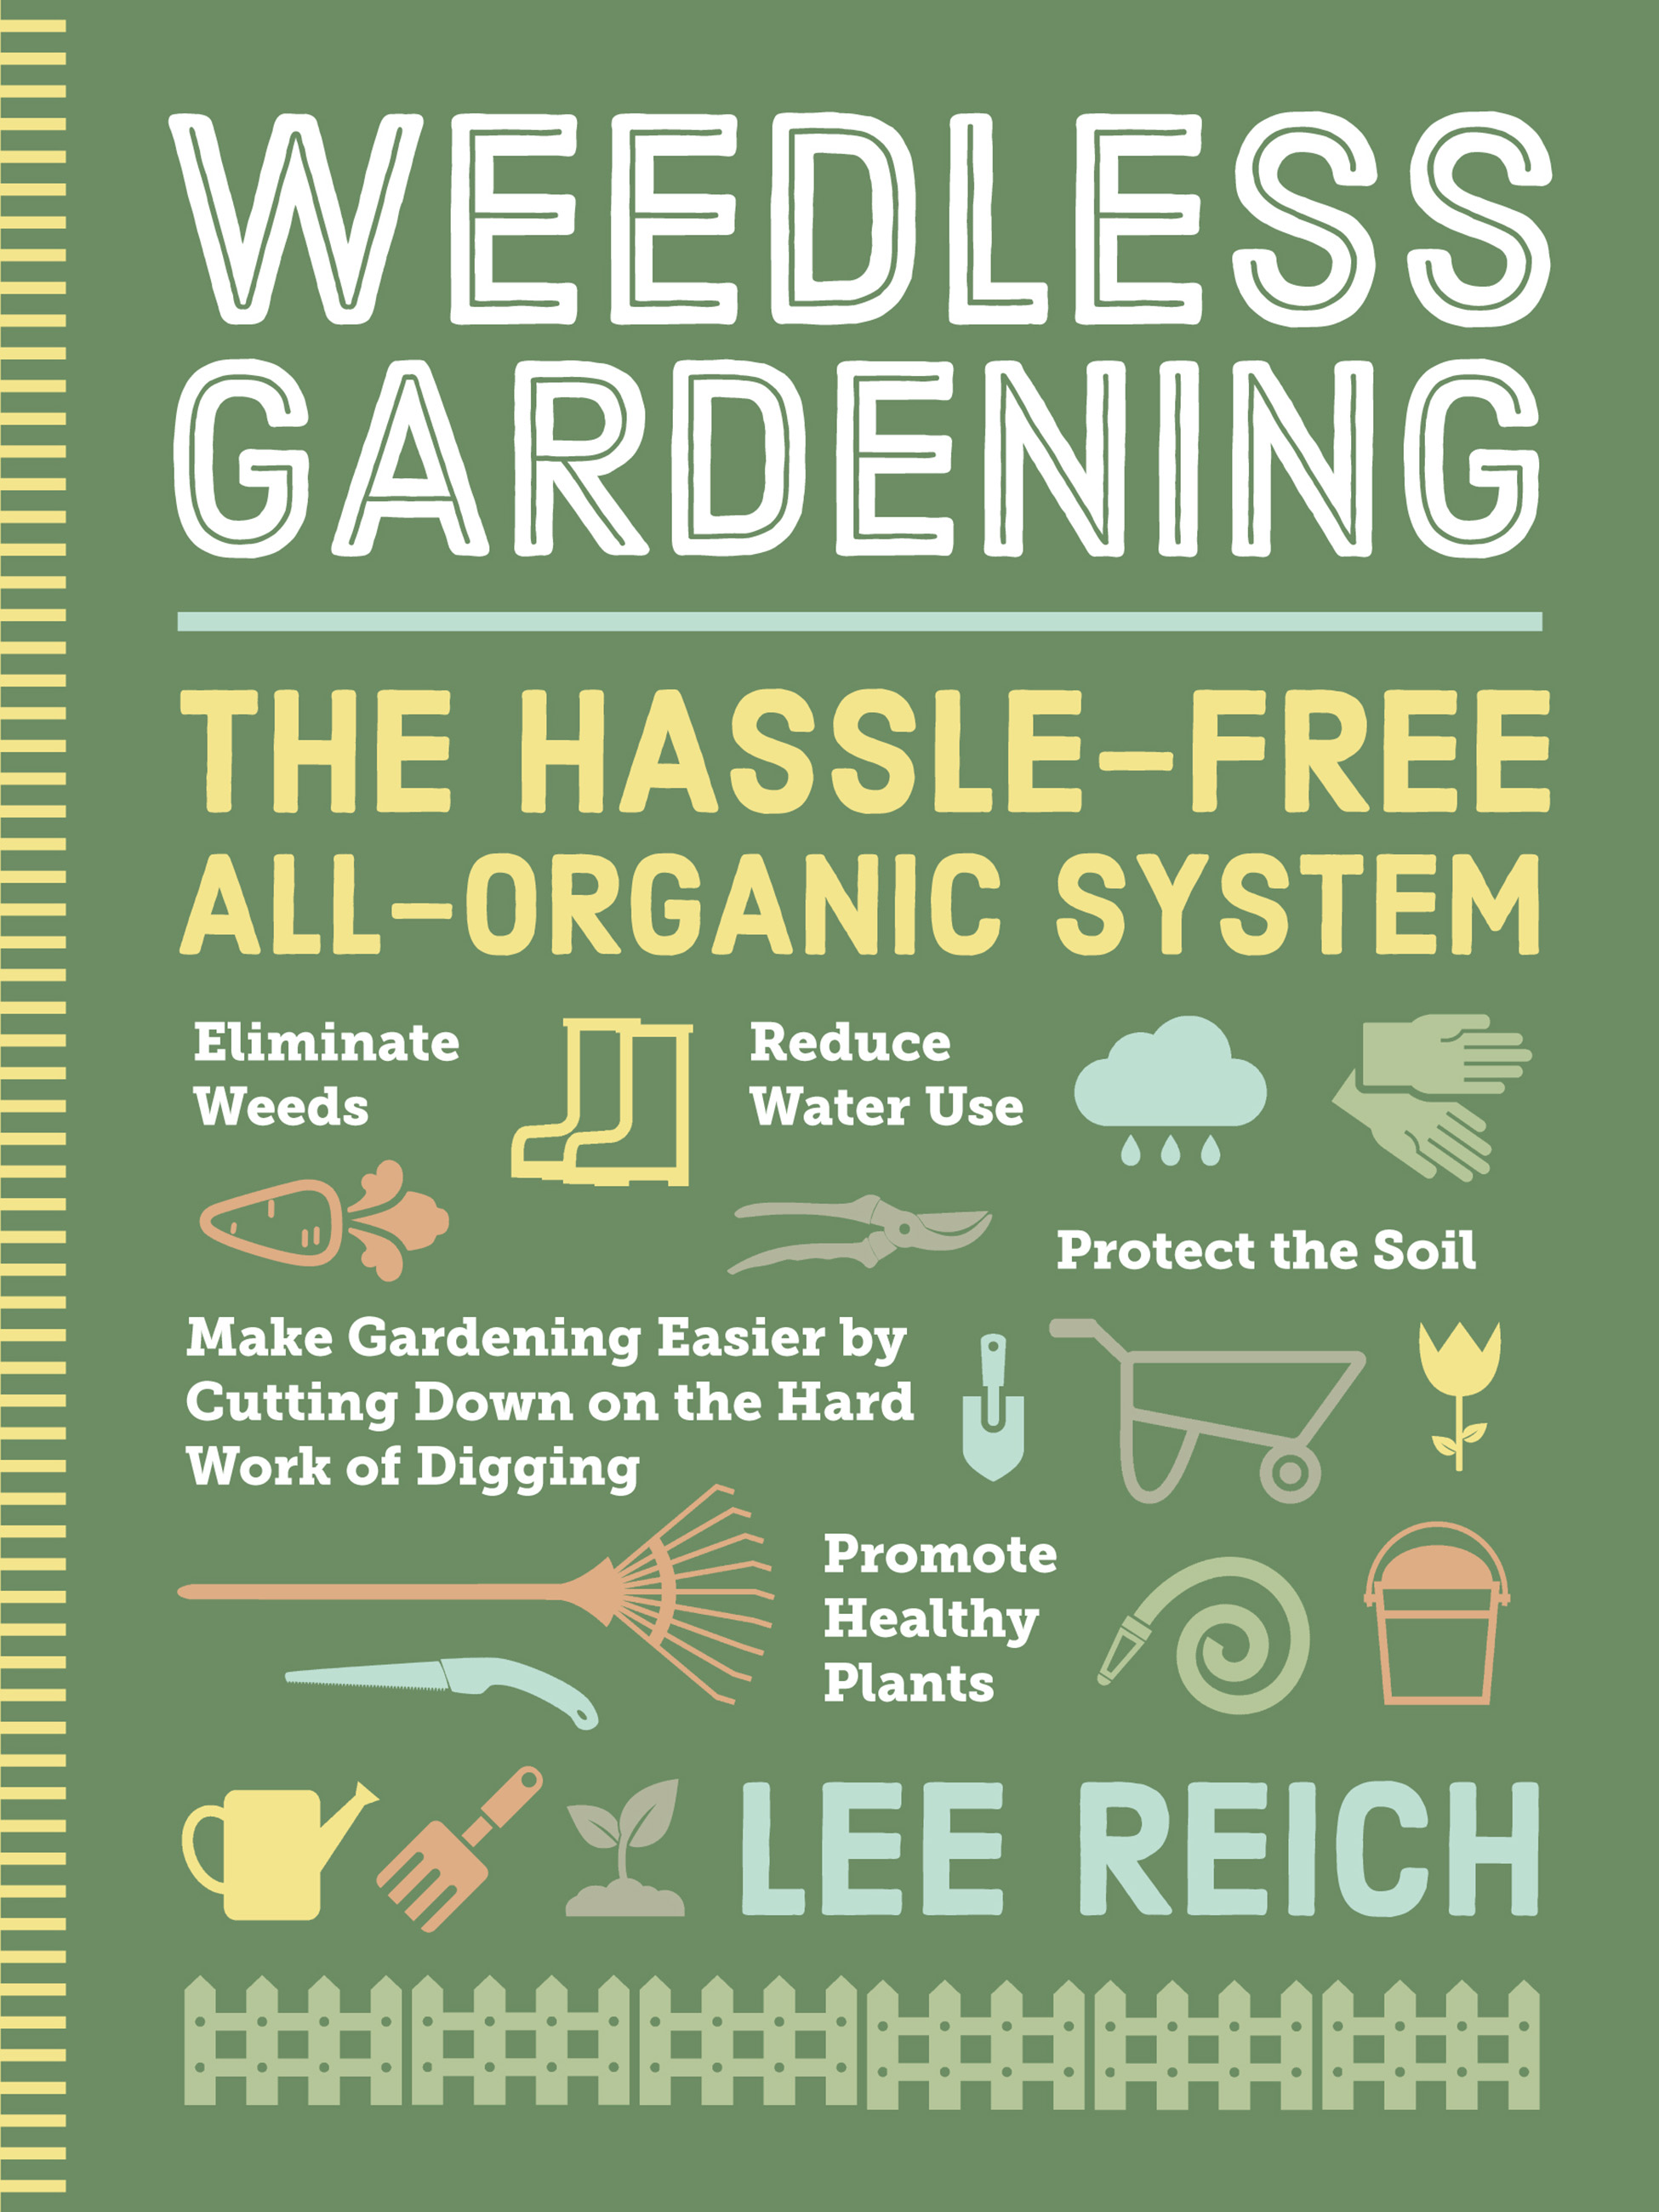 Cover Image of Weedless Gardening